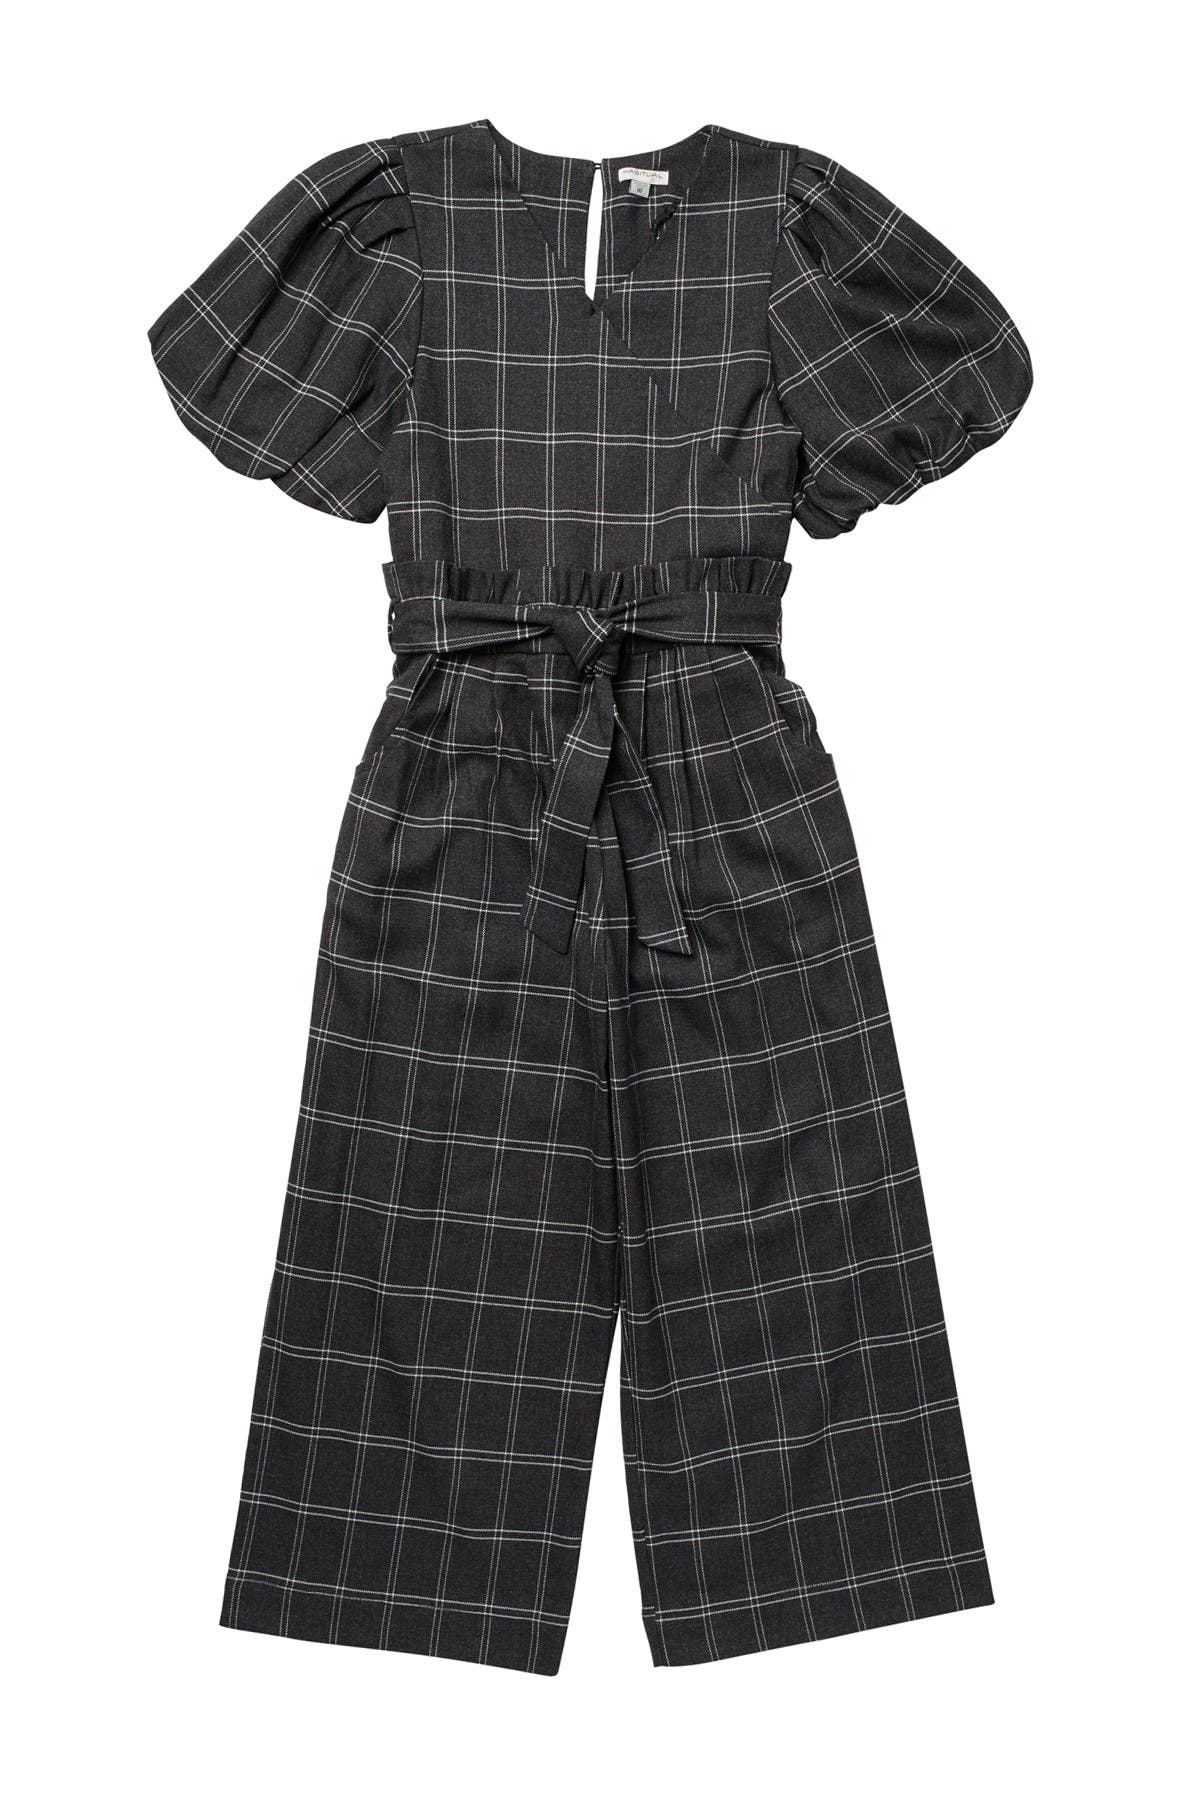 Image of Habitual Kids Charlie Plaid Wrap Jumpsuit